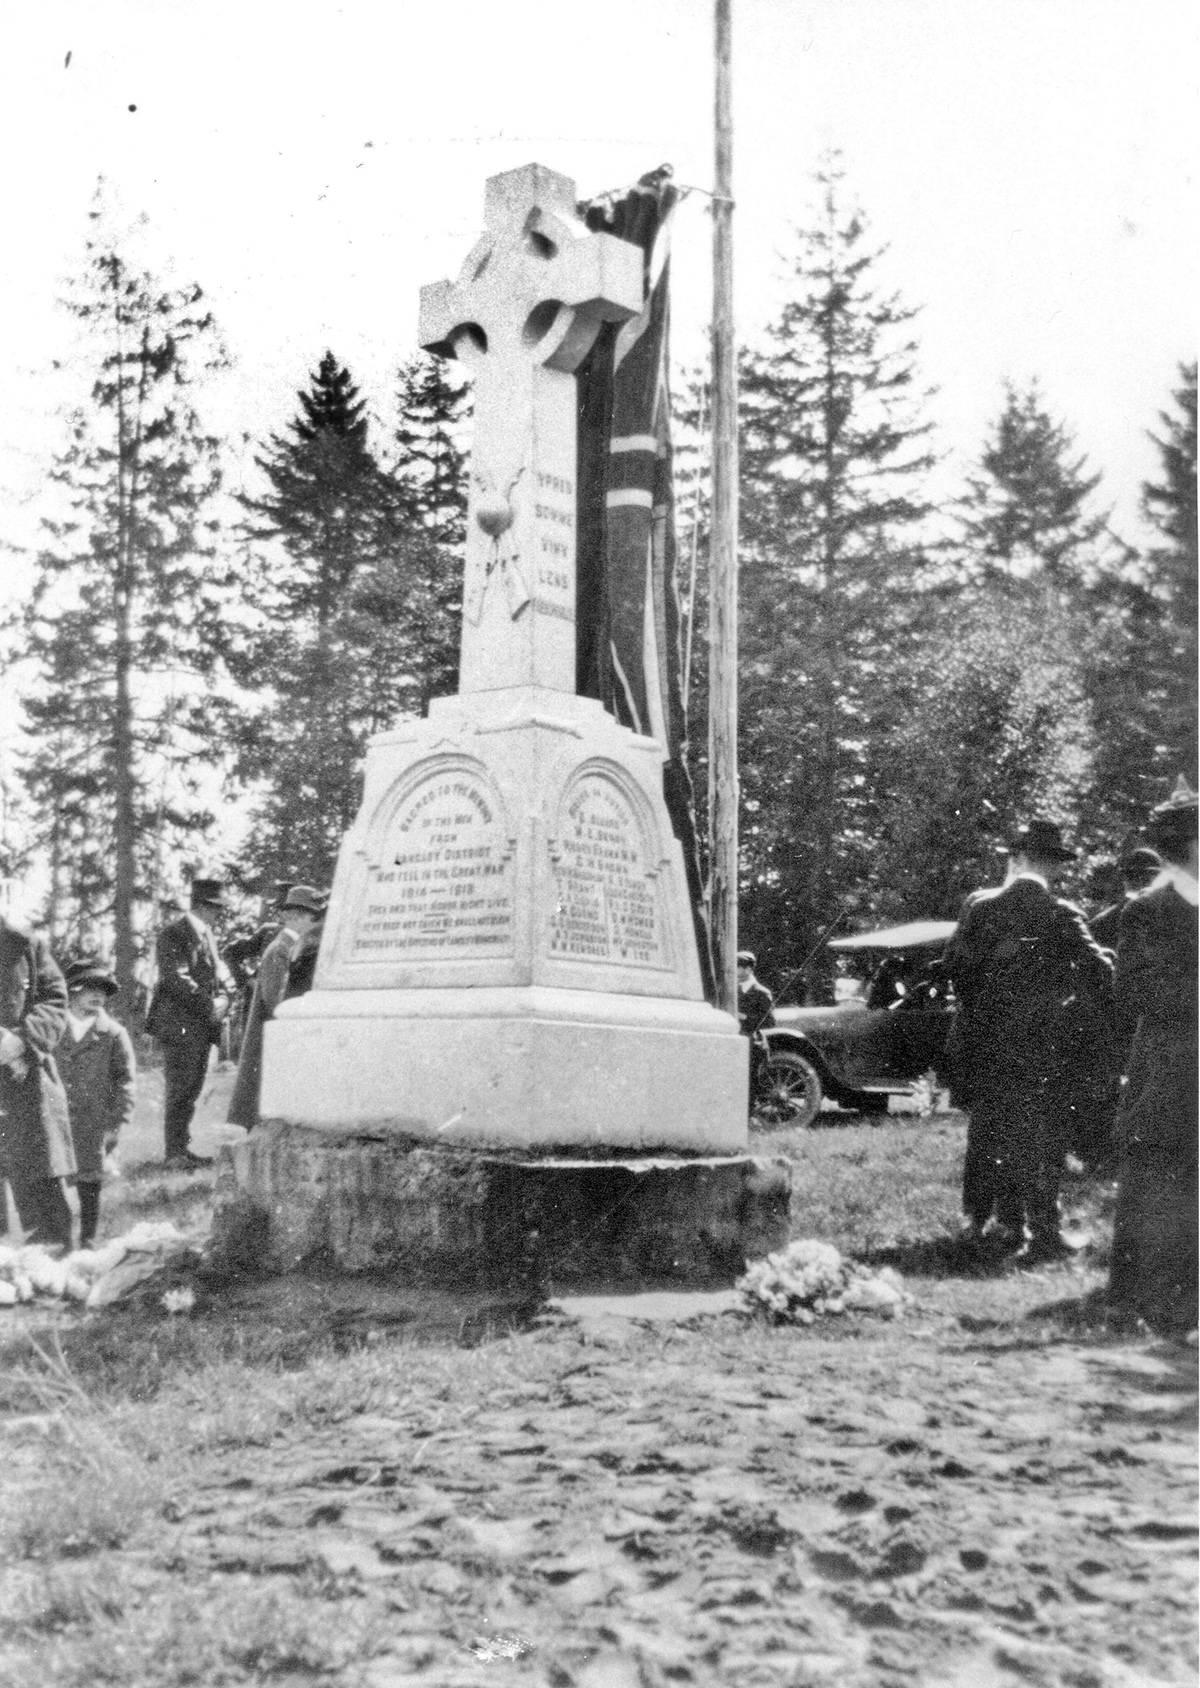 Unveiling of Murrayville's War Memorial in September 1920.